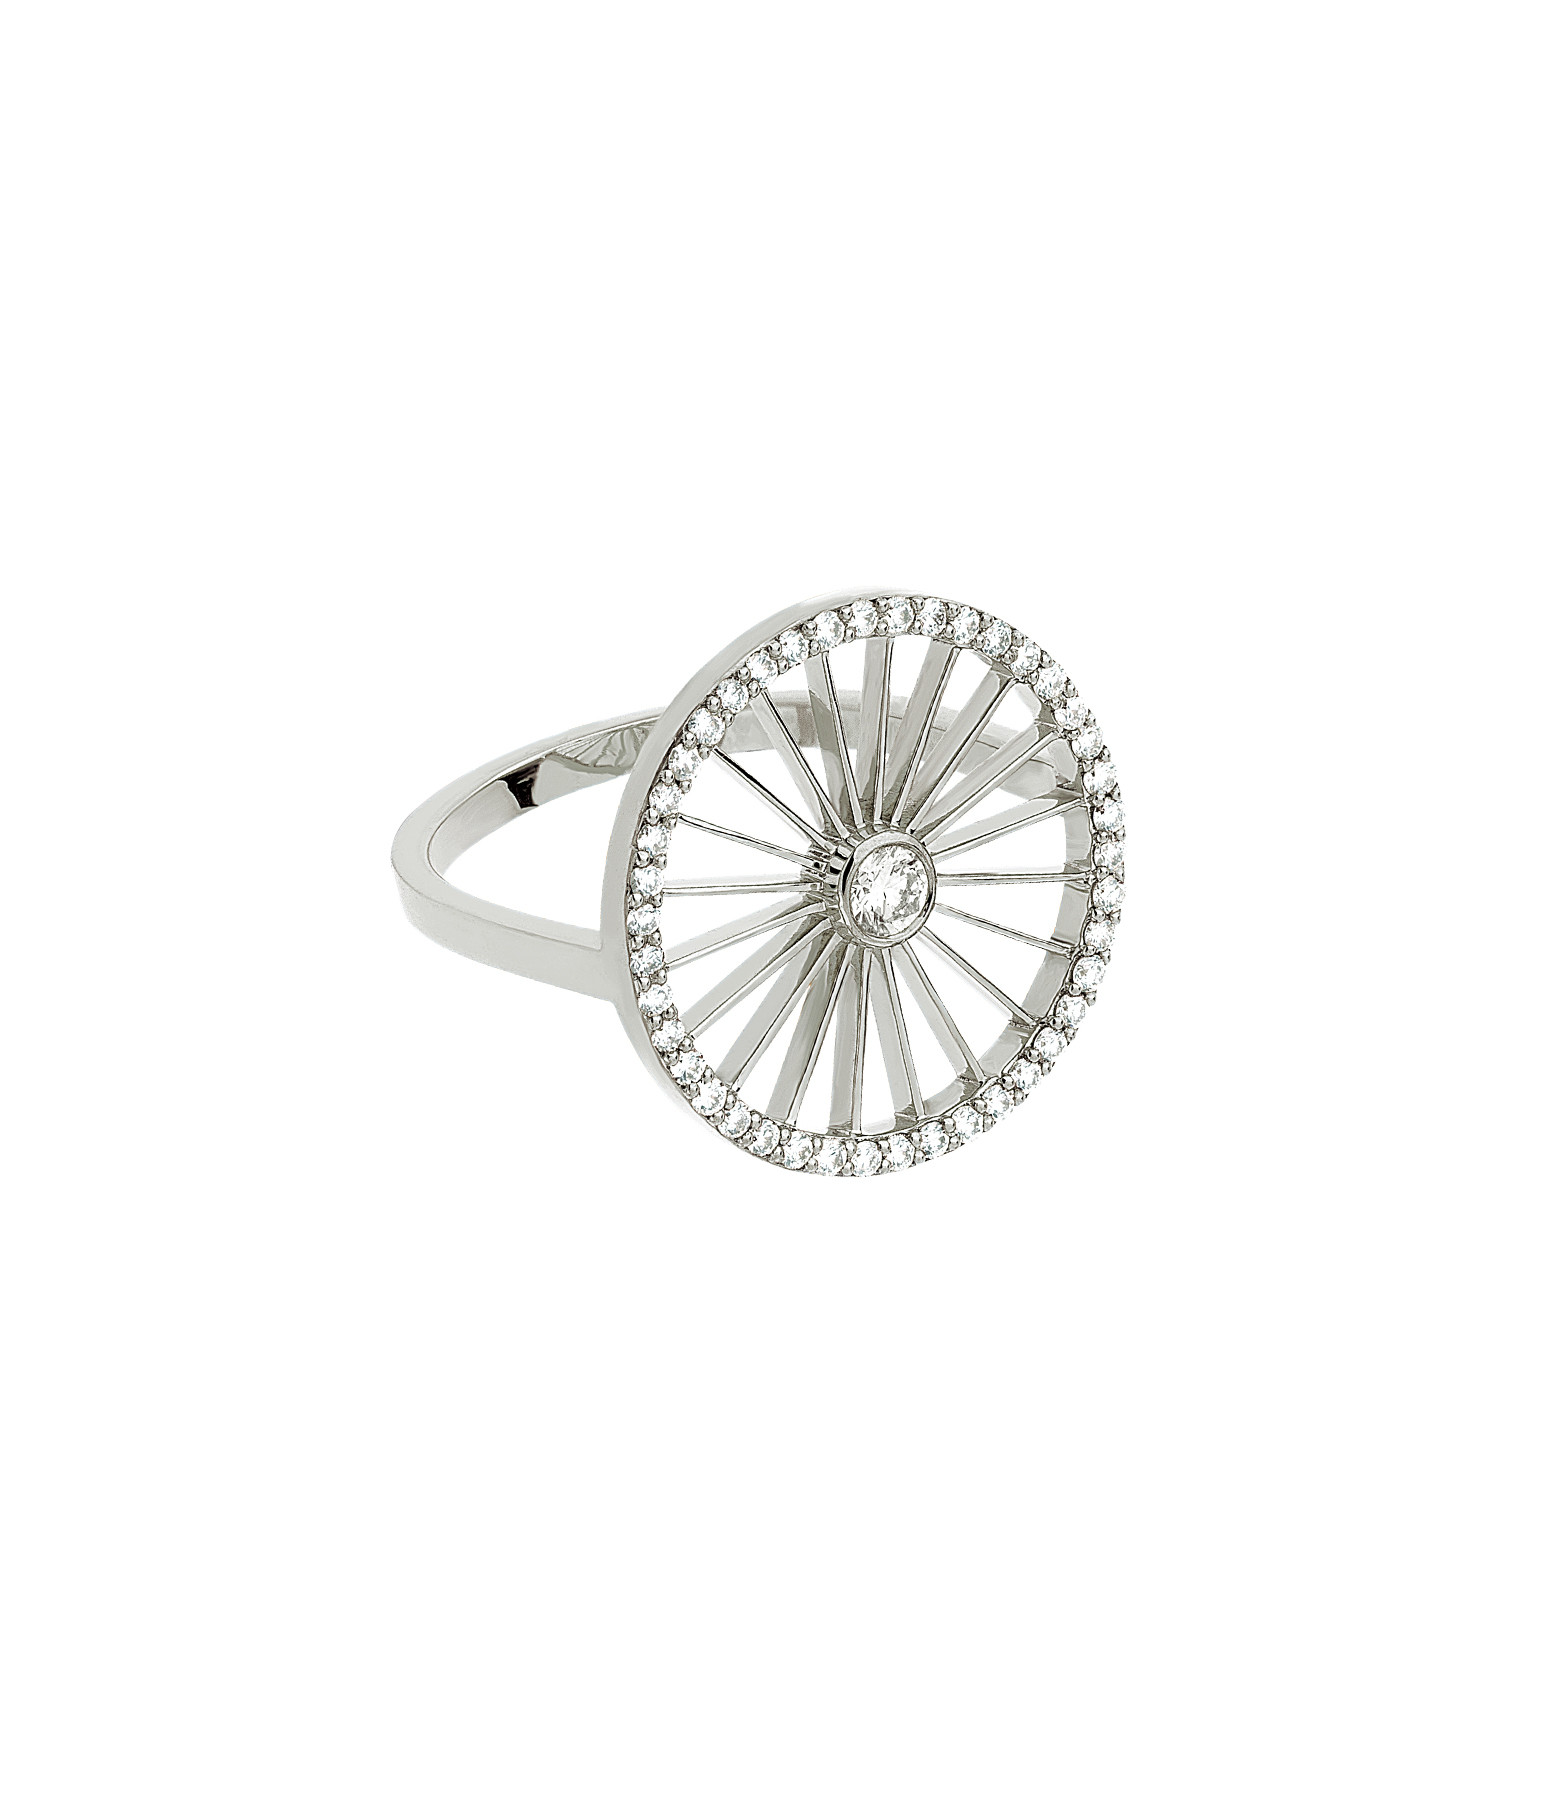 NAVA JOAILLERIE - Bague Cheyenne Plate Ronde Diamants Or Blanc